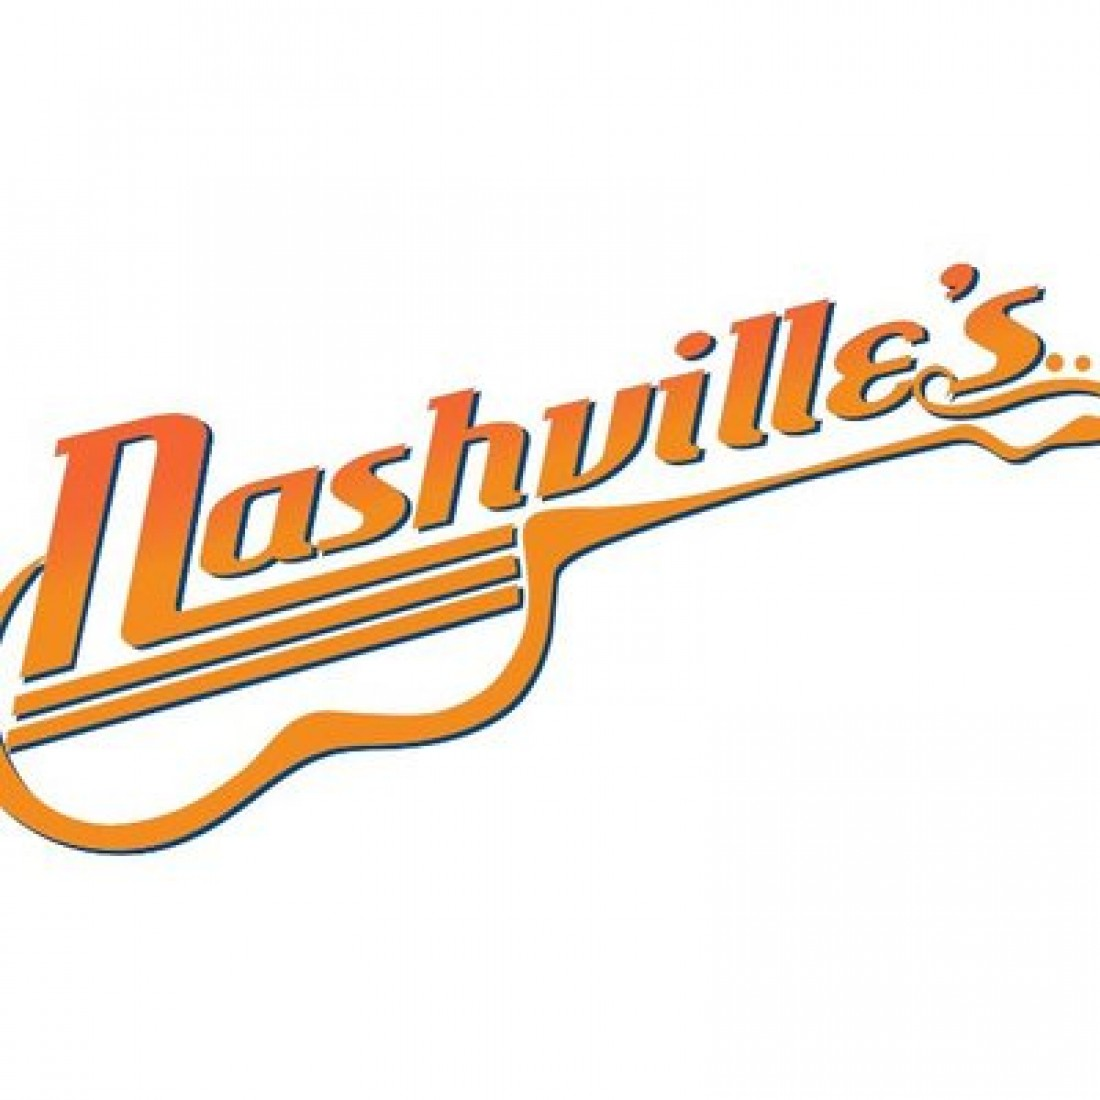 Nashville's